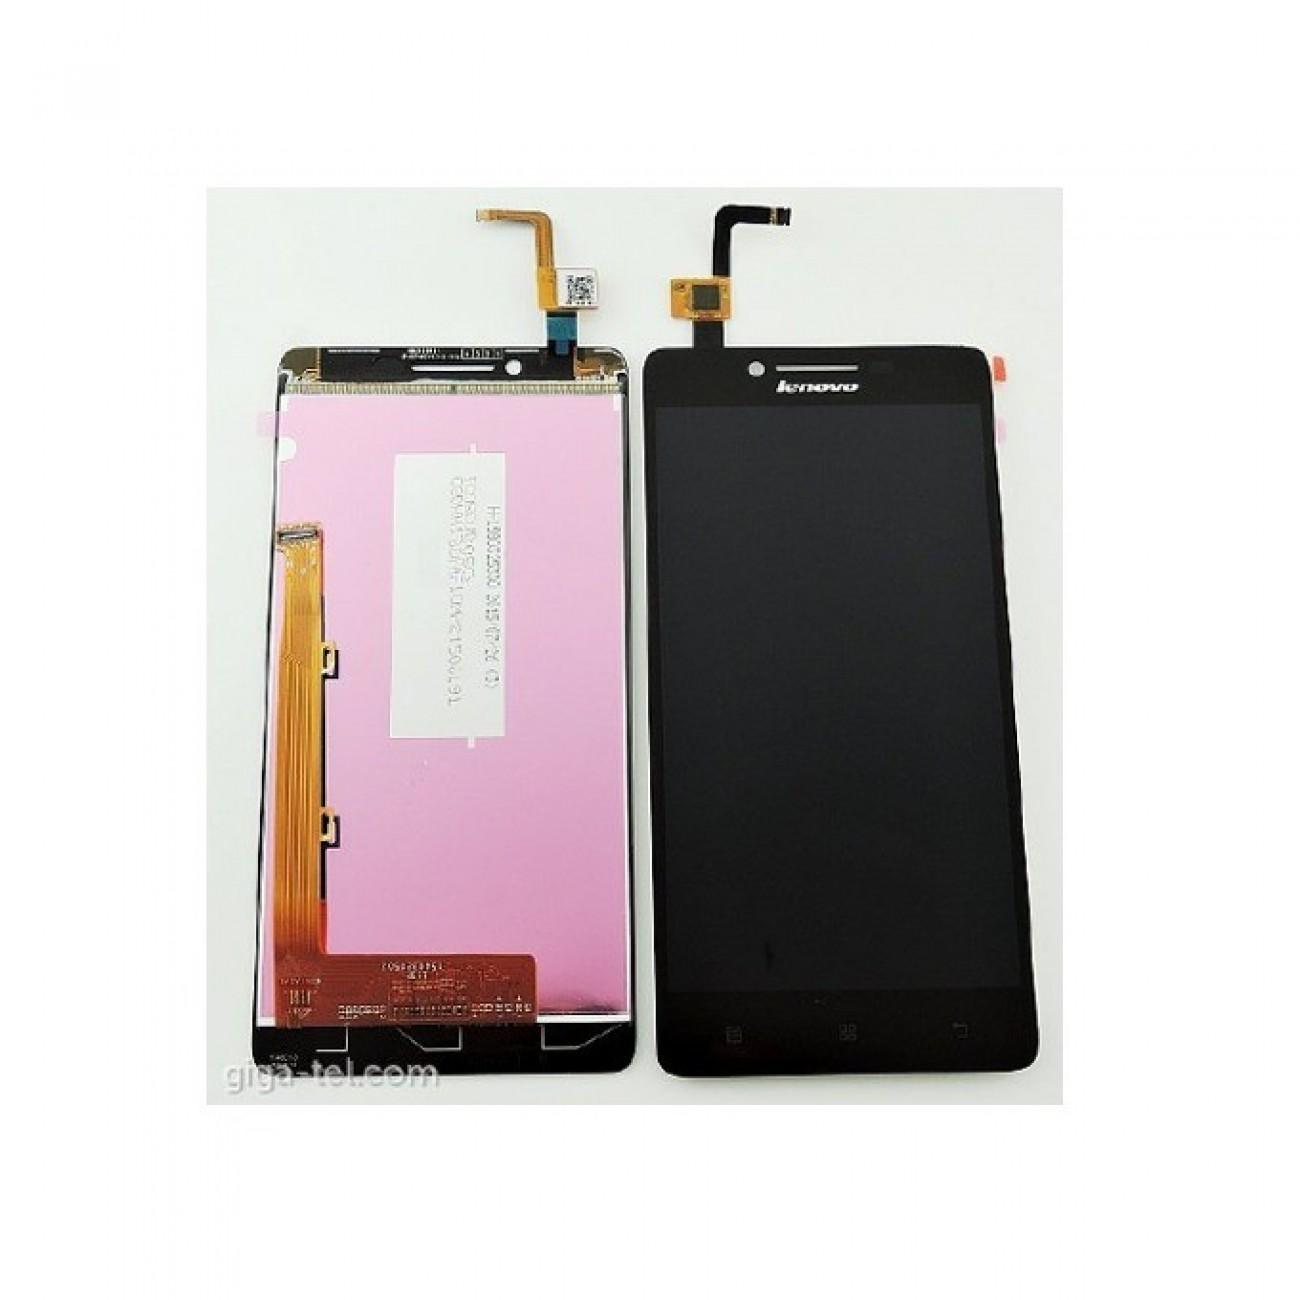 Дисплей за Lenovo A6000, LCD Original, черен в Резервни части -  | Alleop